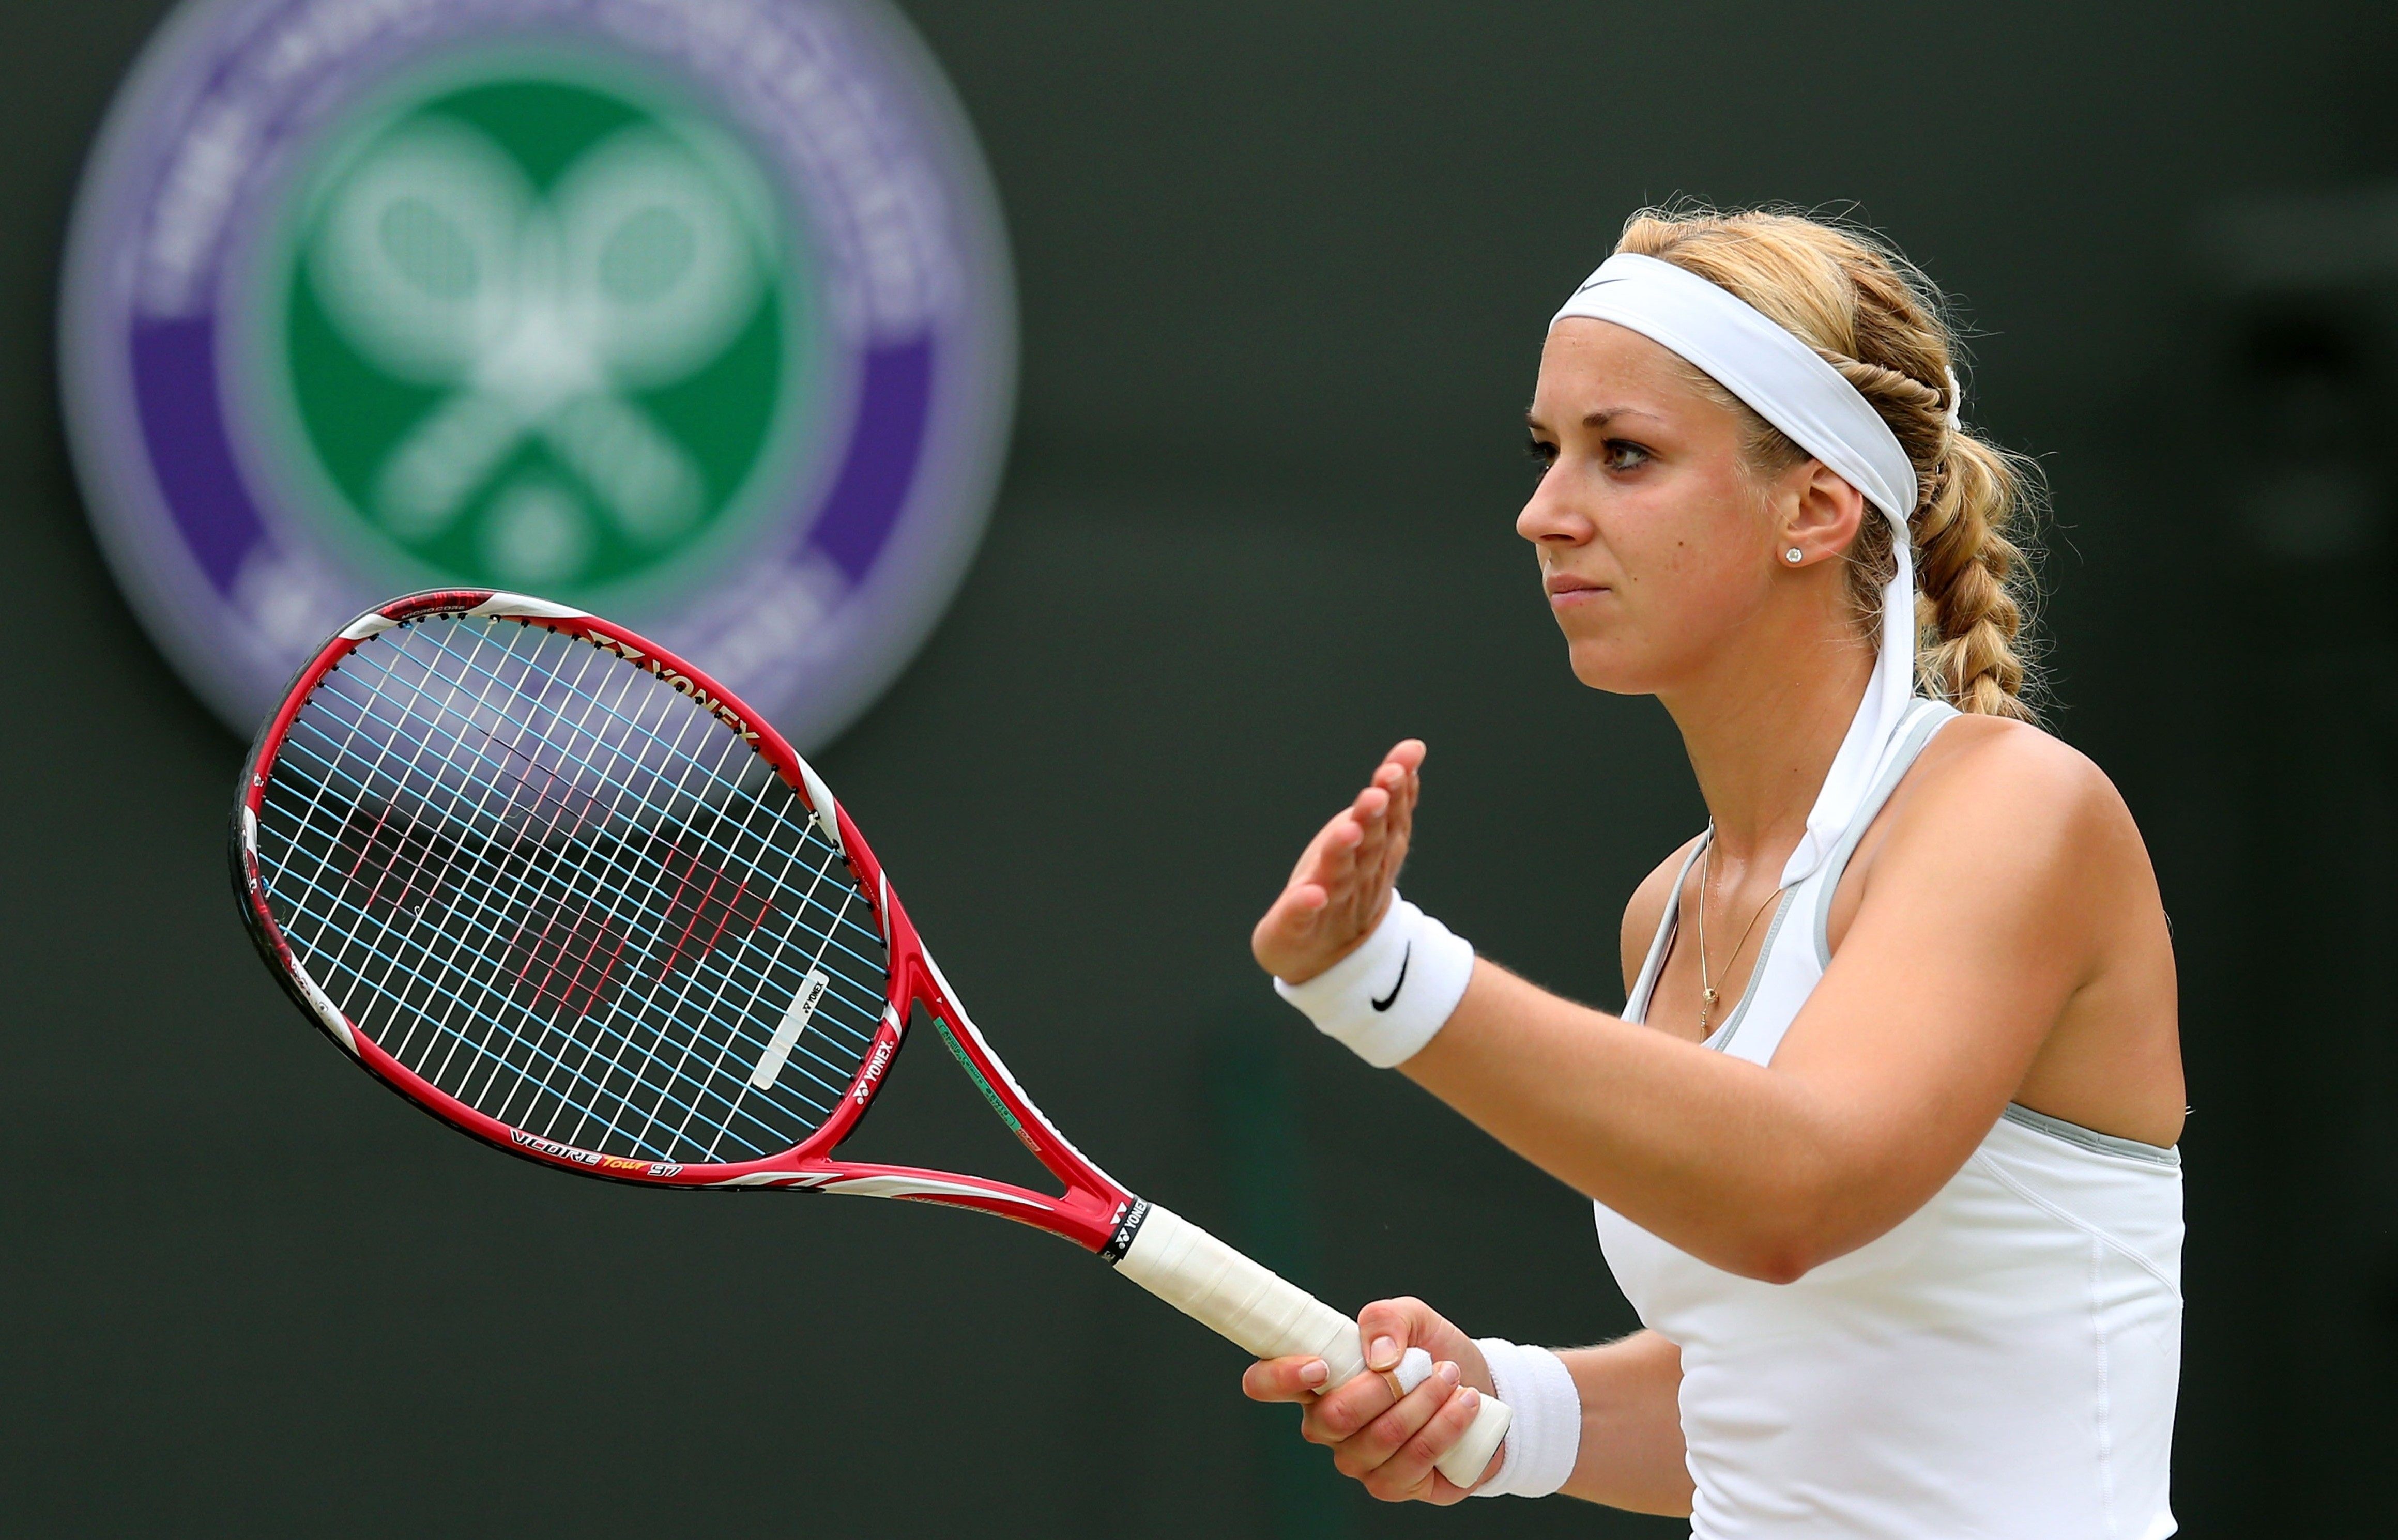 Sabine Lisicki will reach Wimbledon final like I did, insists Steffi Graf